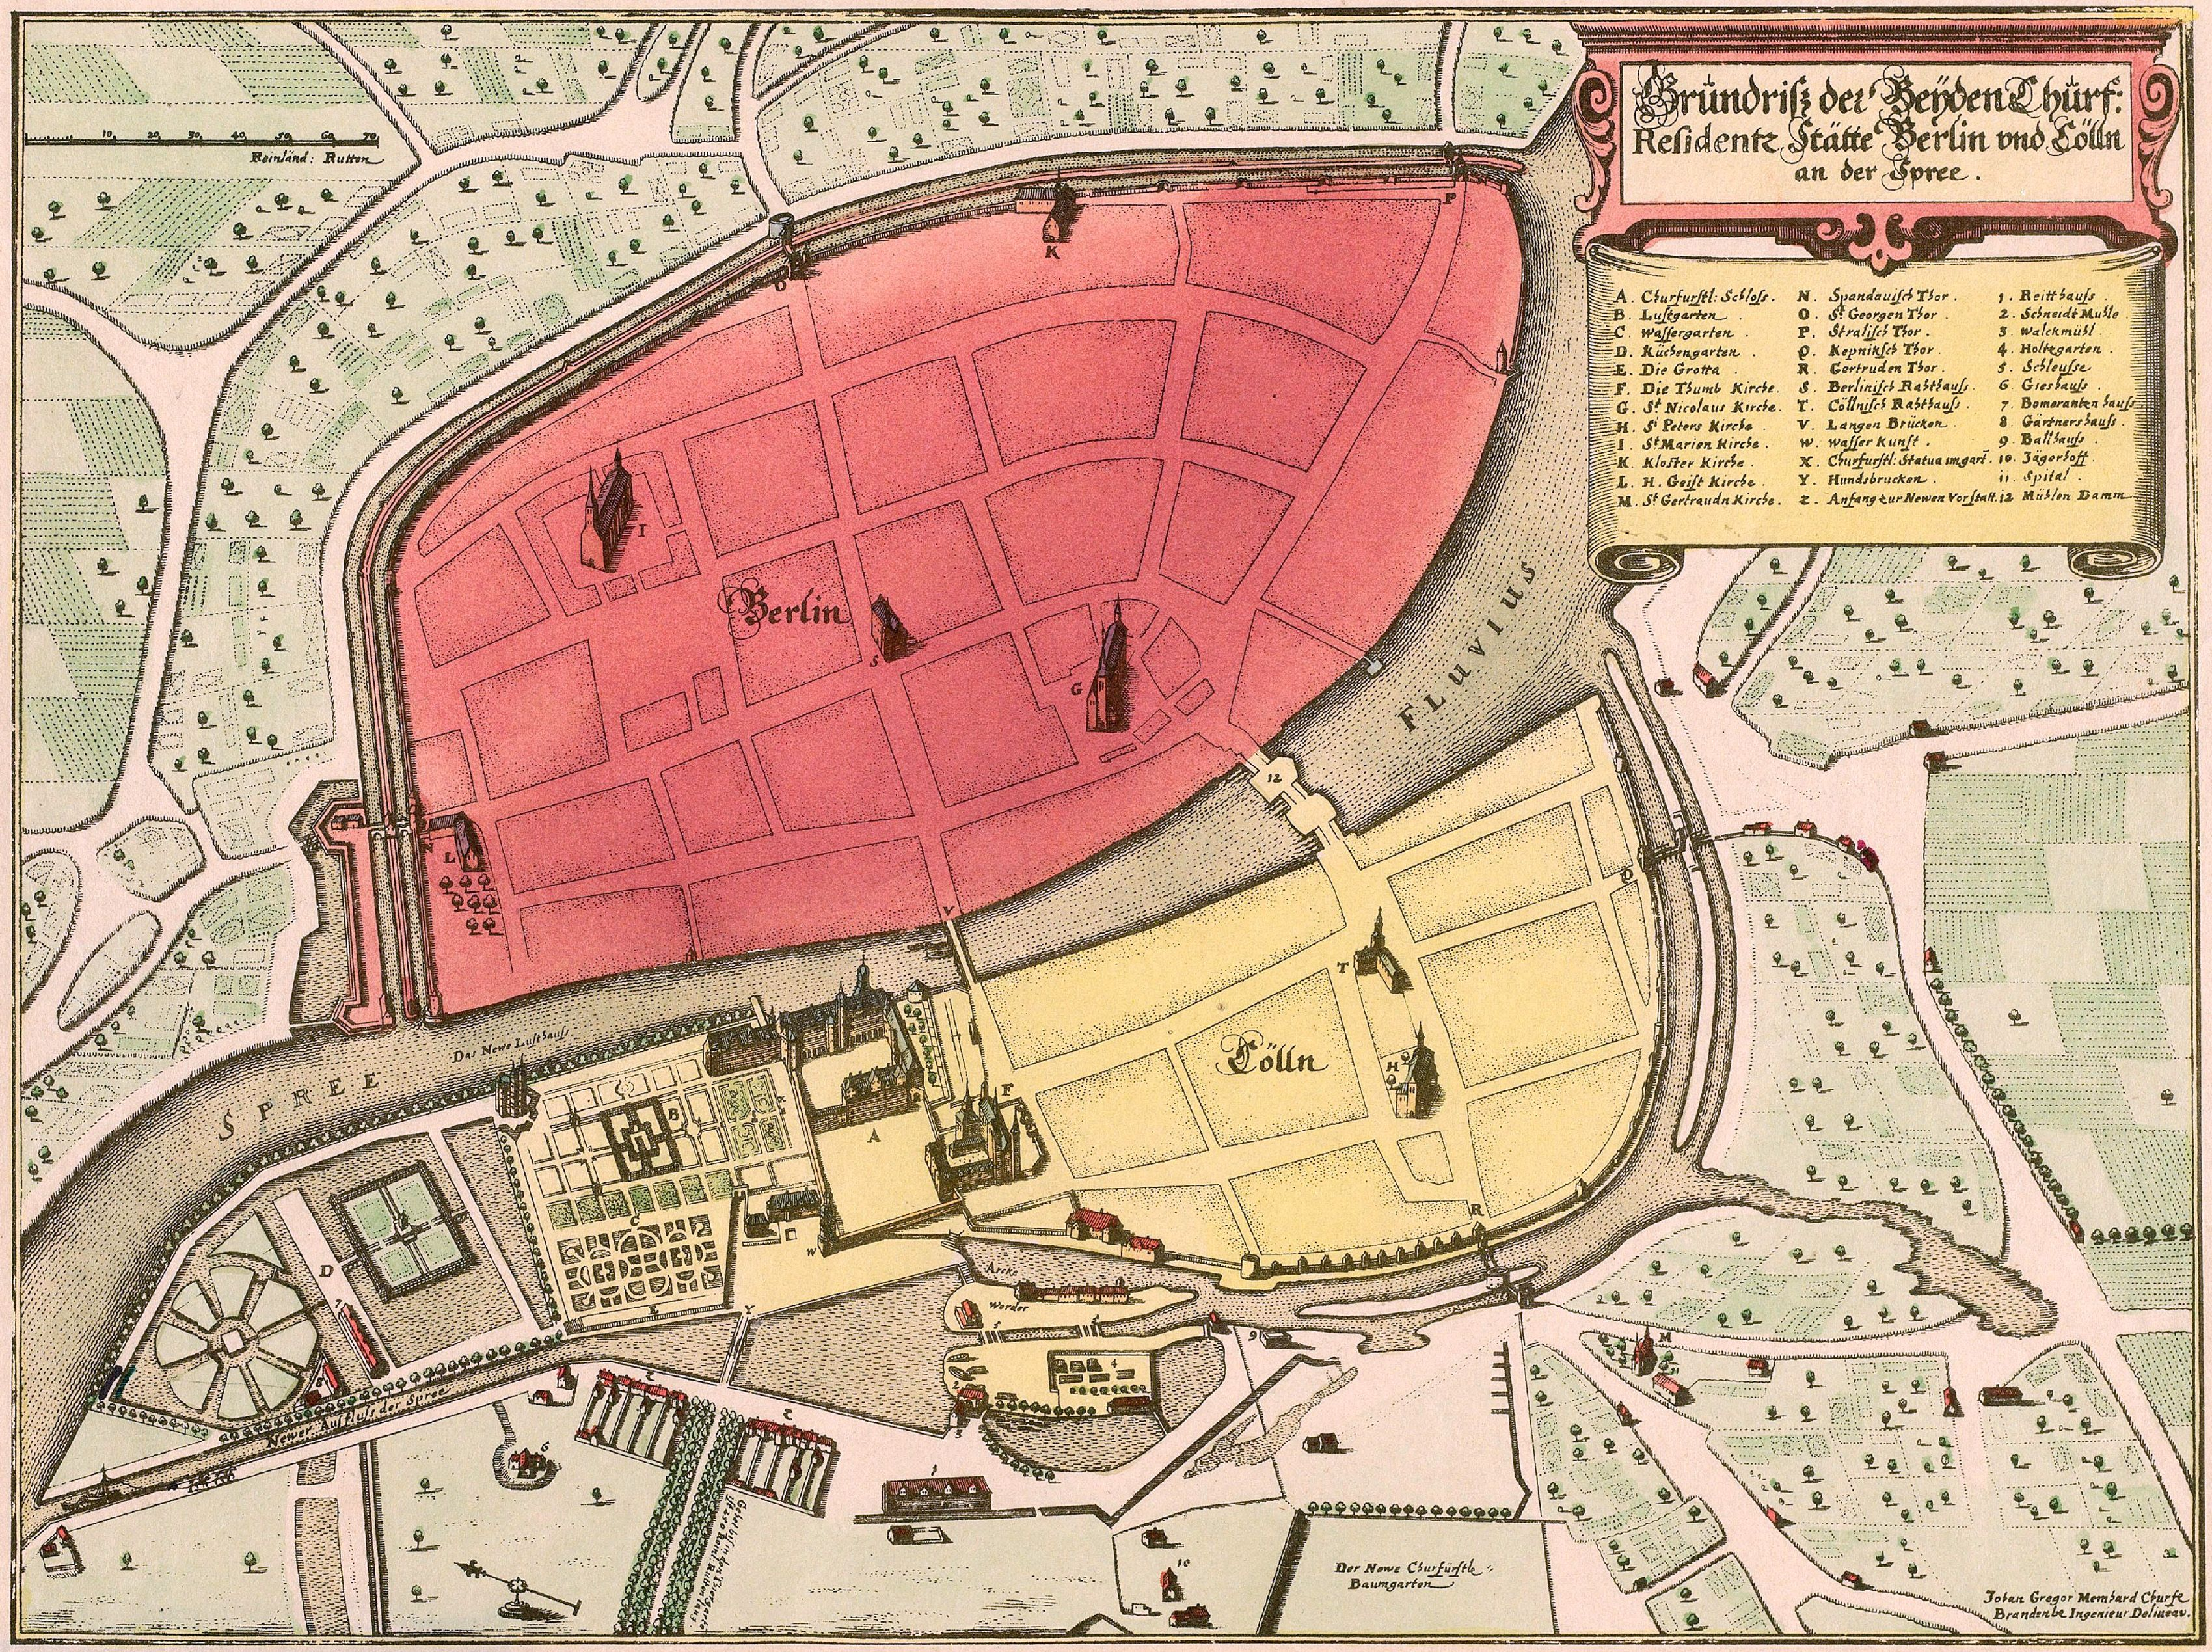 Memhardt Grundriss Der Beyden Churf Residentz Statte Berlin Und Colln 1652 1888 Jpg 3400 2539 Berlin Berlin Karte Stadtplan Berlin